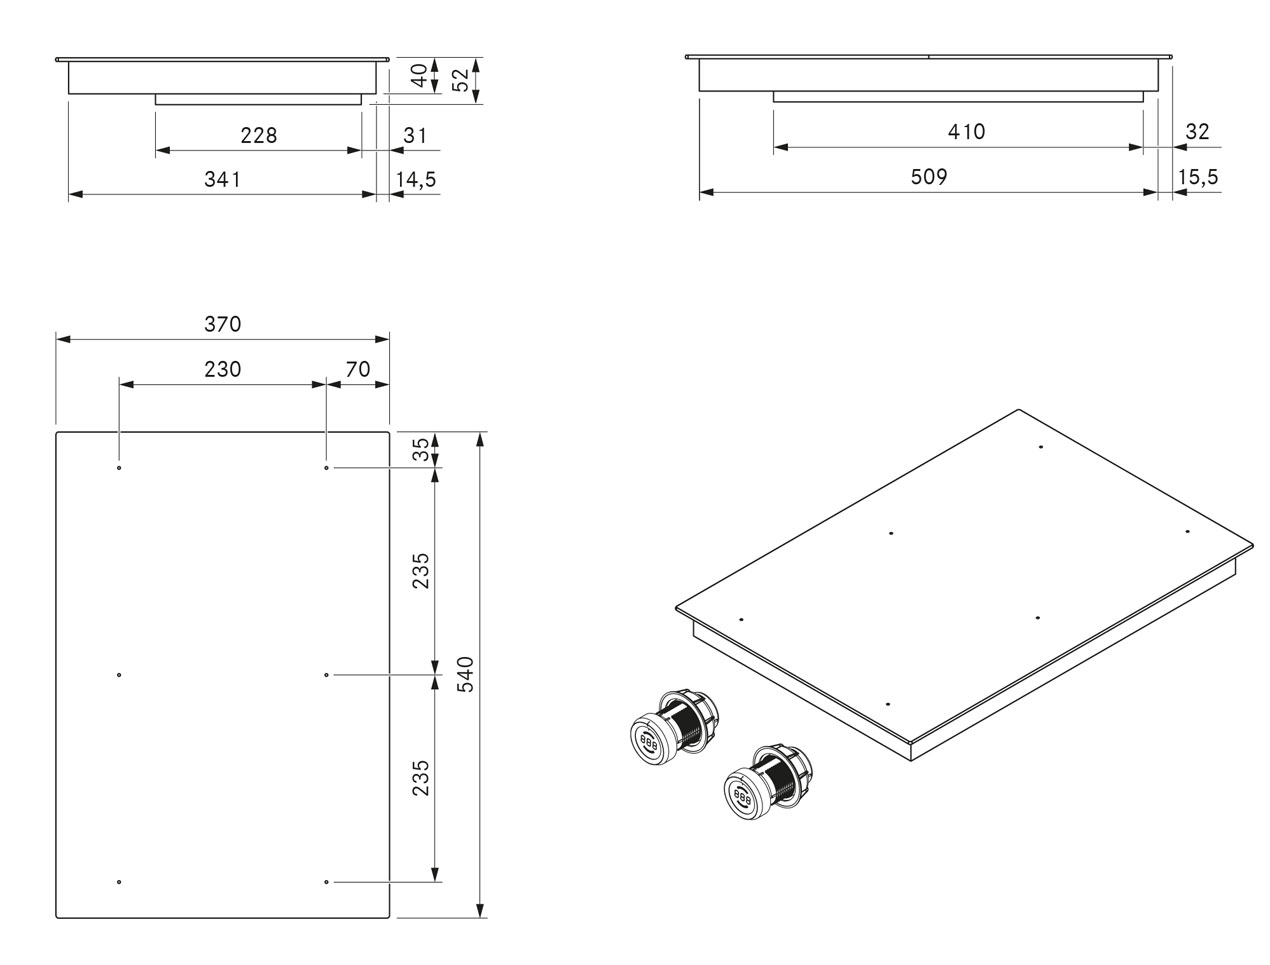 pkfi11 fl chen induktions kochfeld dunstabzug center. Black Bedroom Furniture Sets. Home Design Ideas